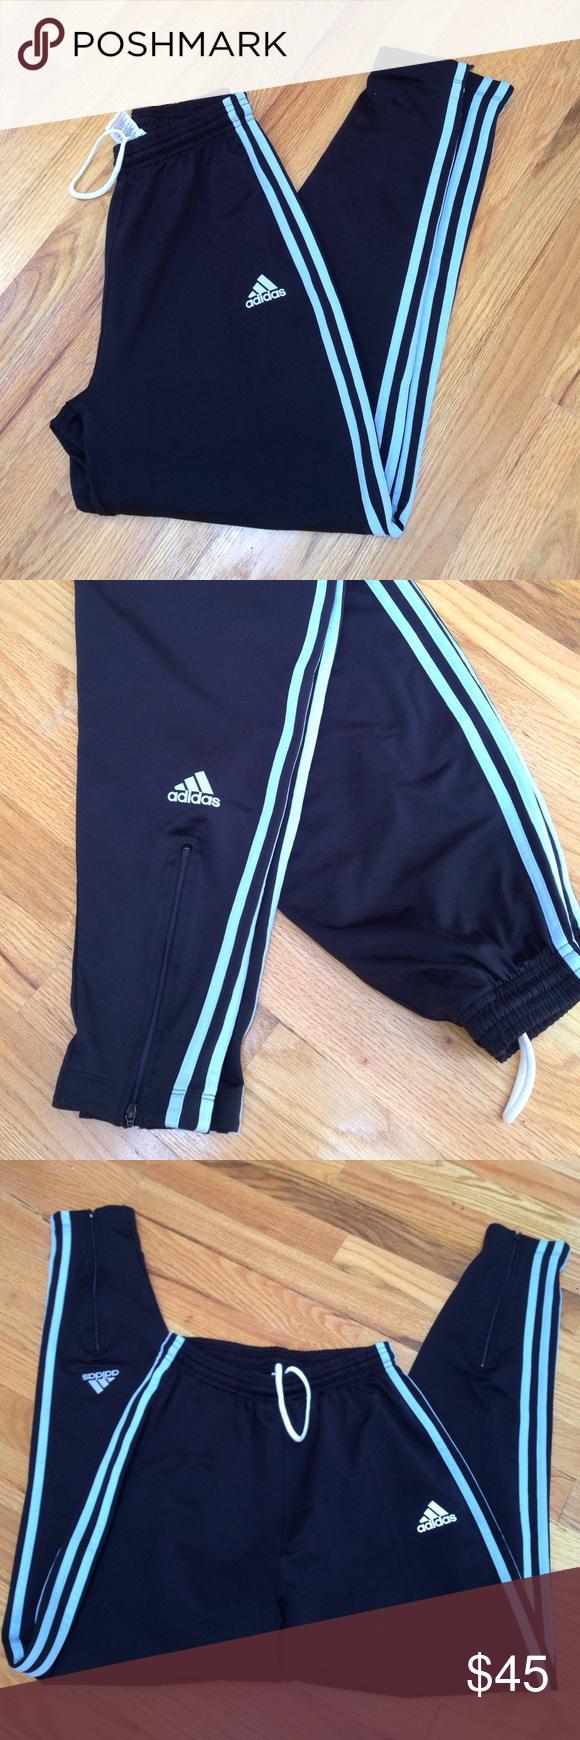 af74b4cbeb54 Adidas pants Adidas track pants with stripe down leg. Back of leg zipper  with adidas